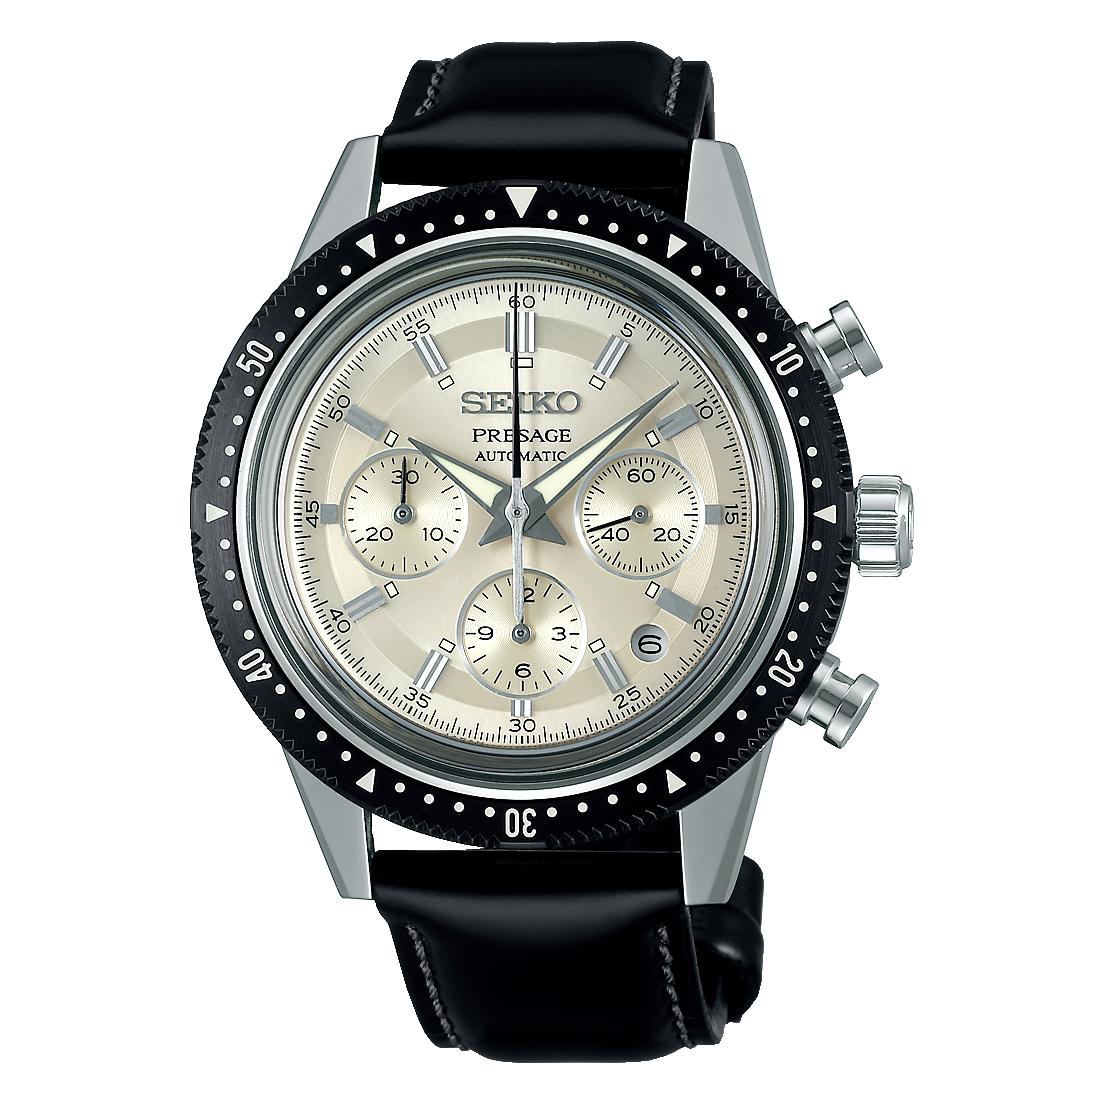 Seiko Automatik Chronograph Presage SRQ031 / SRQ031J1 Limited Edition